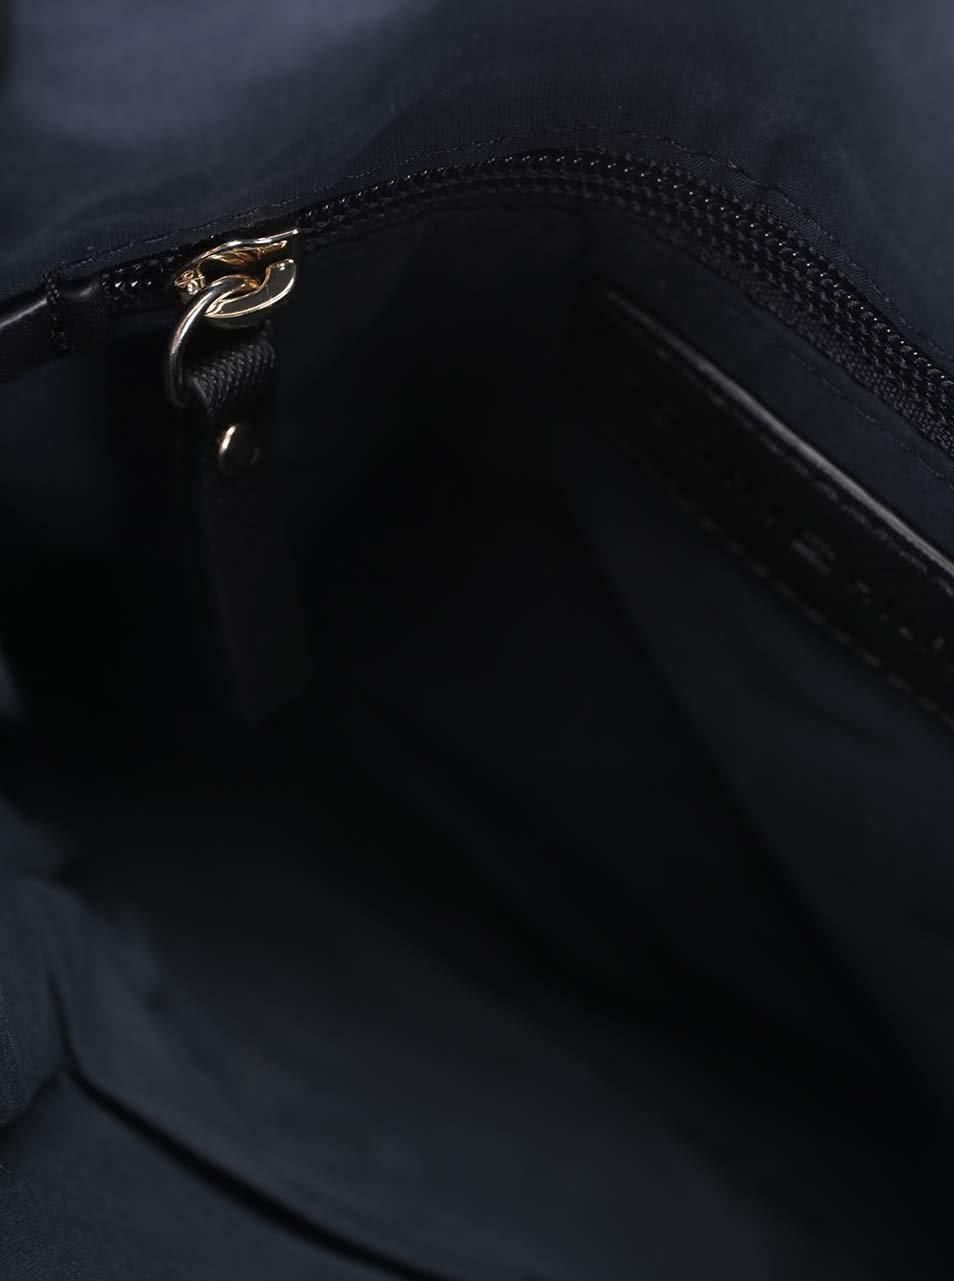 Čierna menšia kabelka so vzorom Tommy Hilfiger ... 64546fef60c